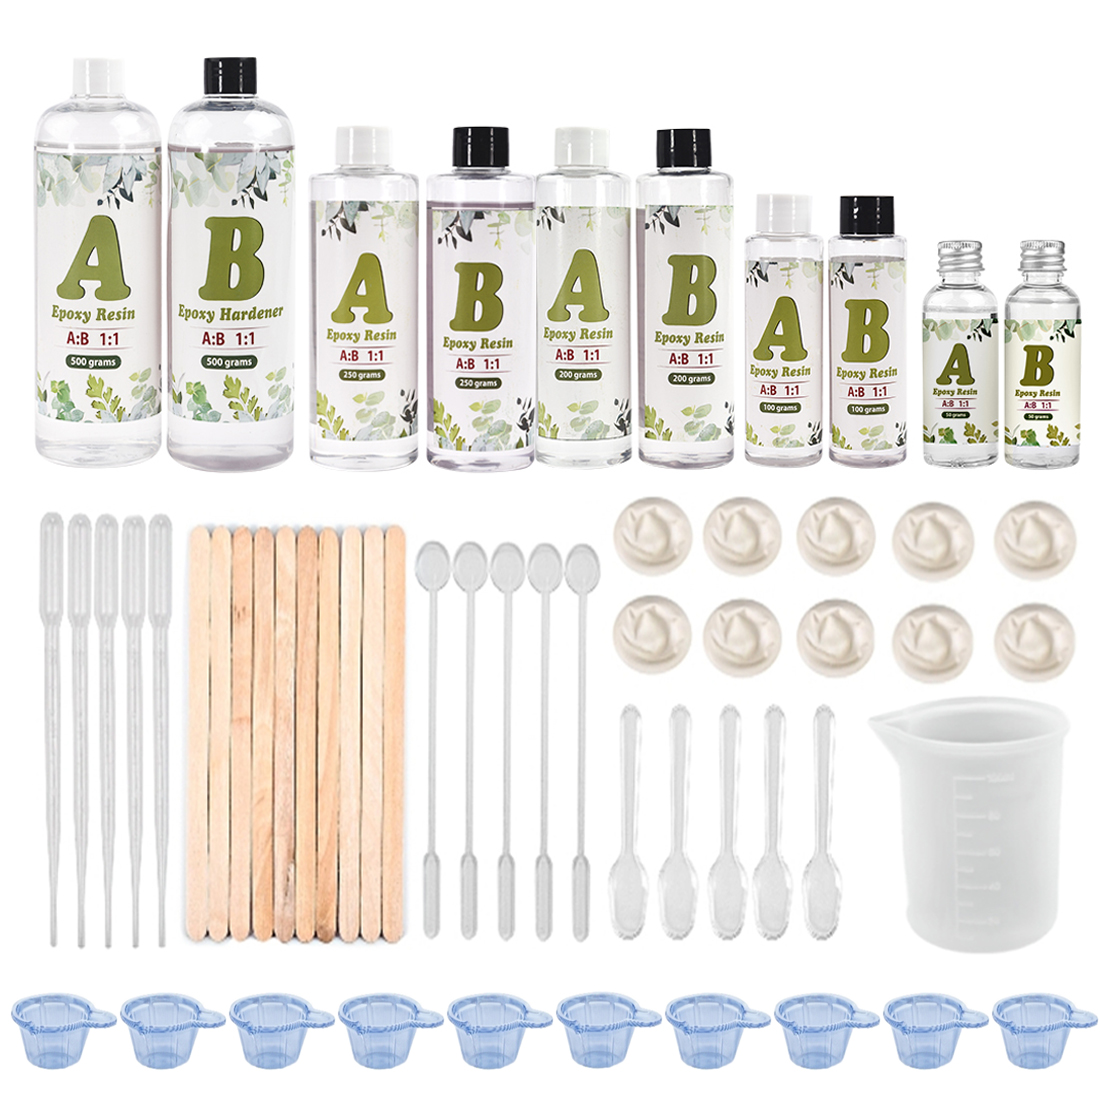 AB Crystal Epoxy Resin Glue Small Bottle 1:1 AB 1 Set Resin Molds Making Tools Starter Set DIY Tools Kits Stirring Stick